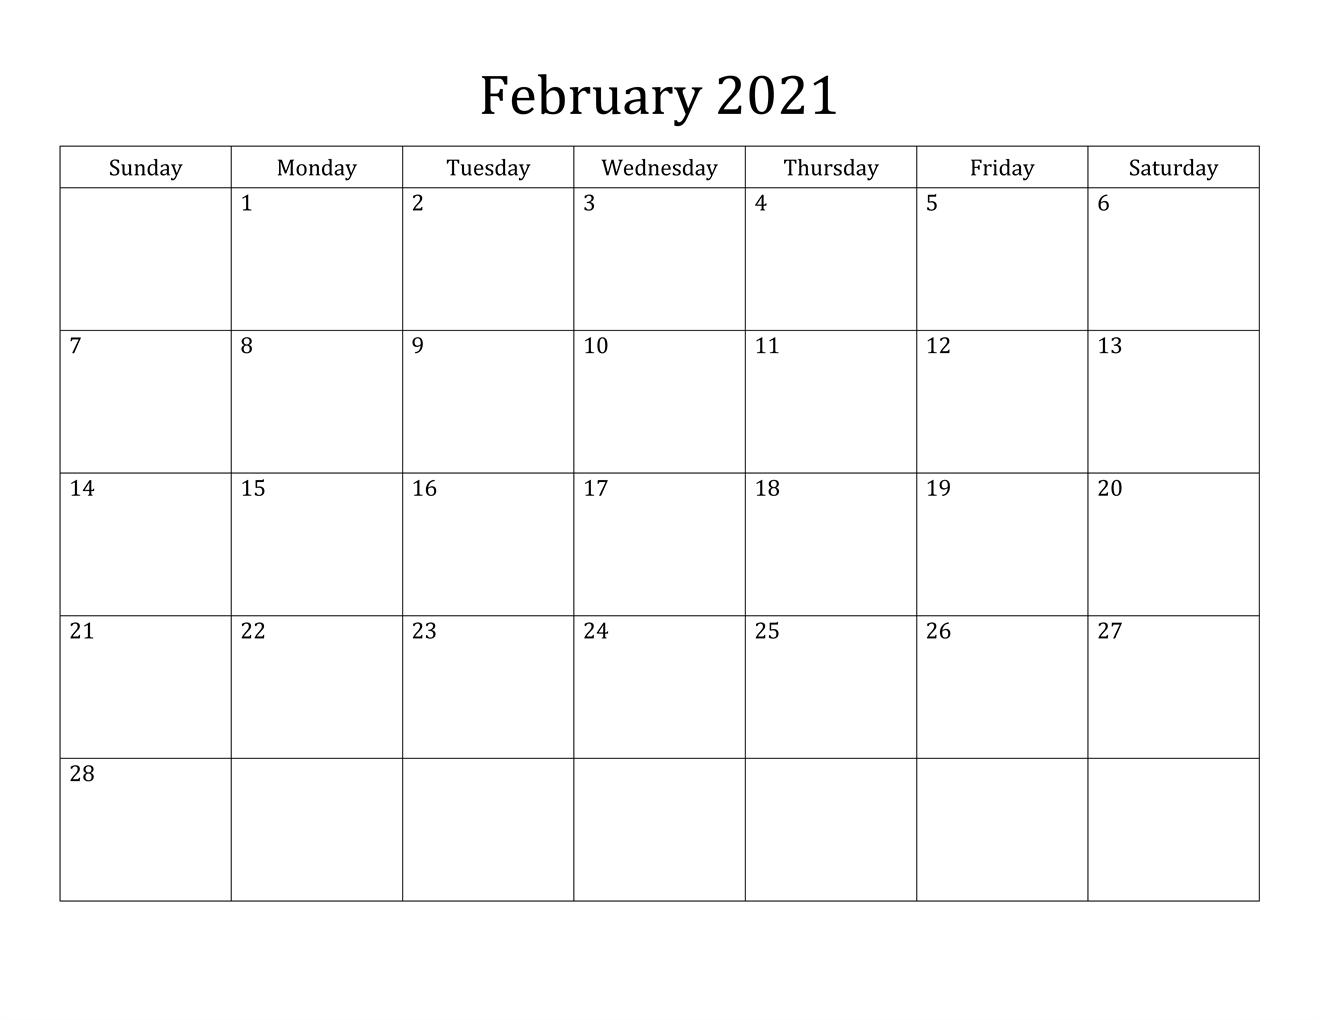 February 2021 Calendar Monday Start